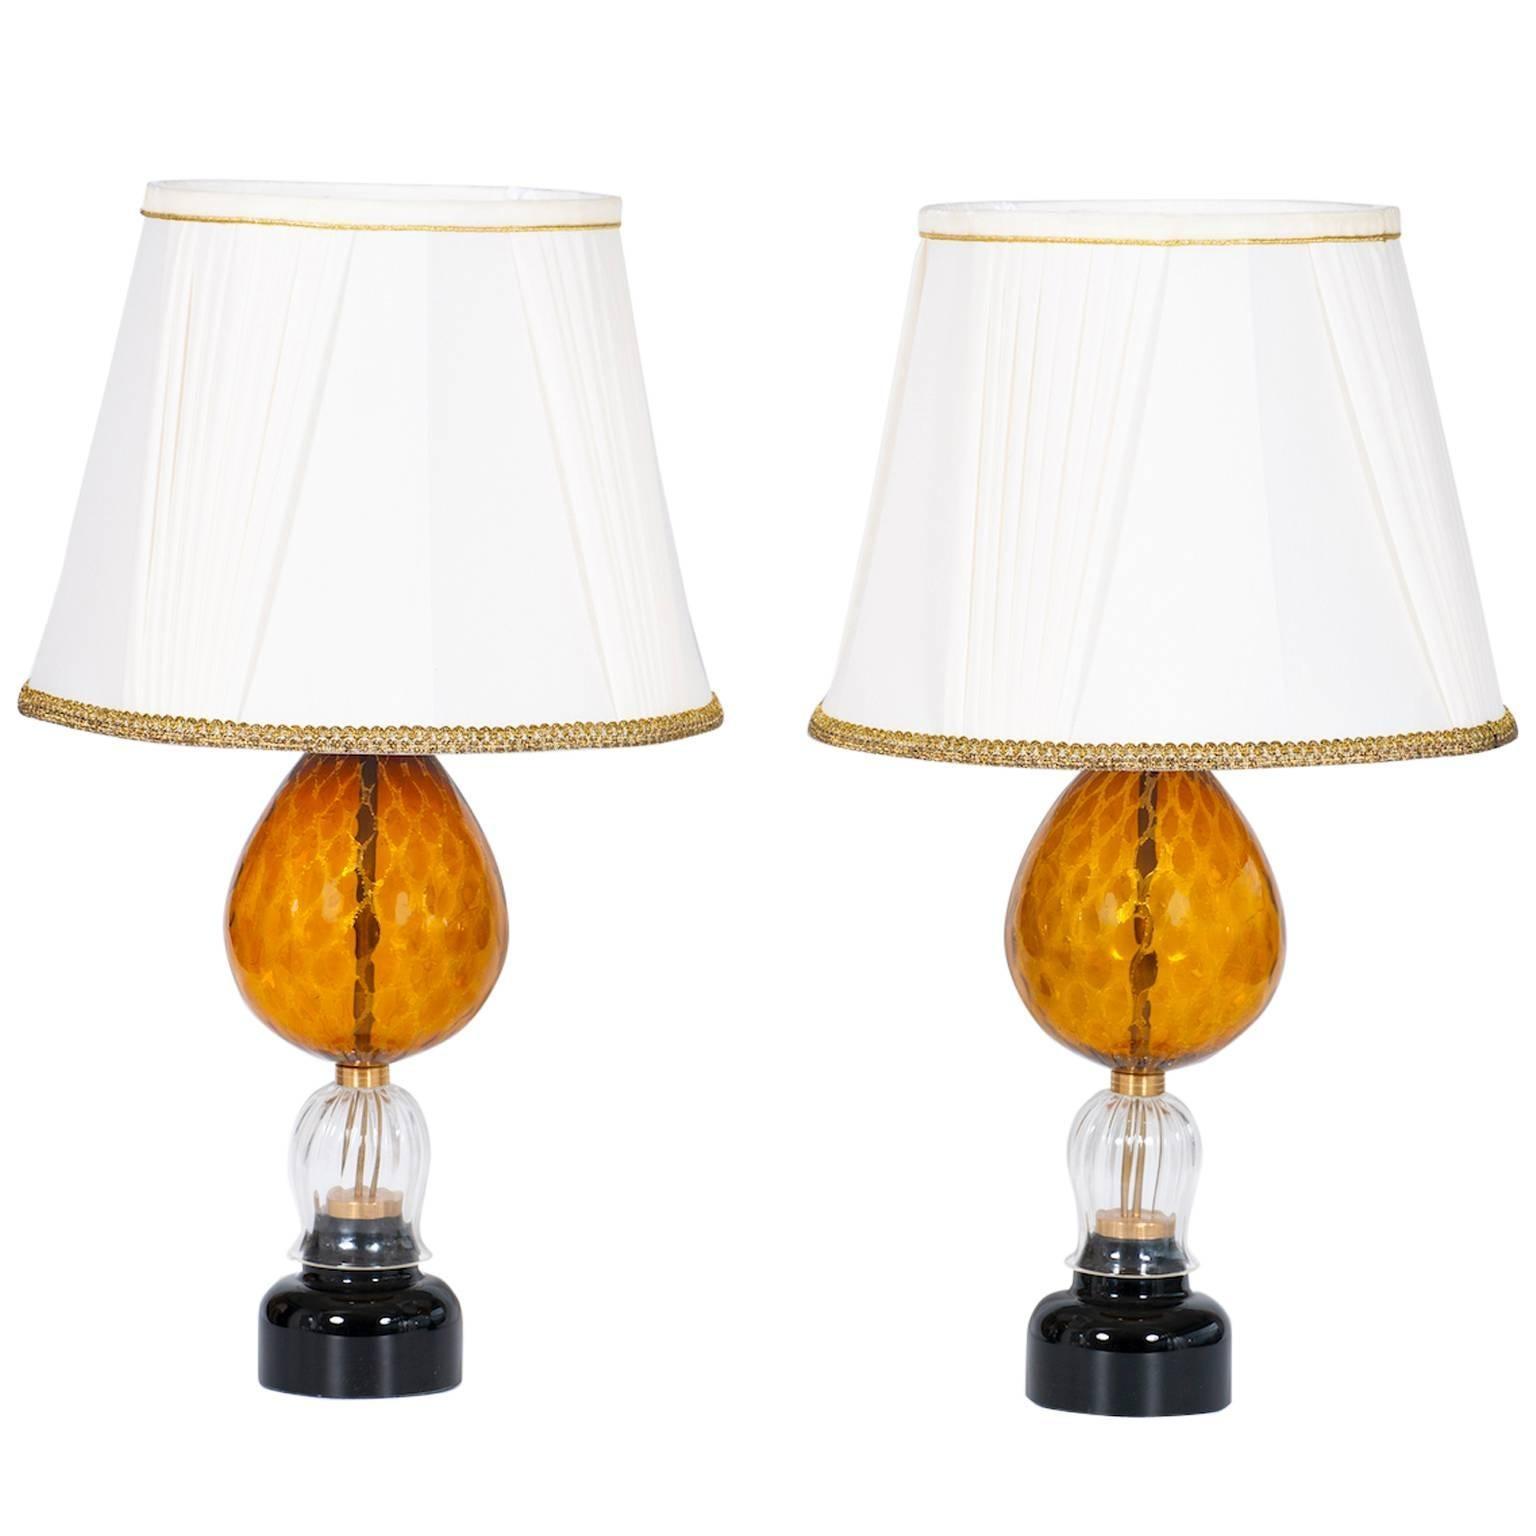 Italian Venetian, Pair Table Lamps, blown Murano Glass, Amber & Dark, 1970s